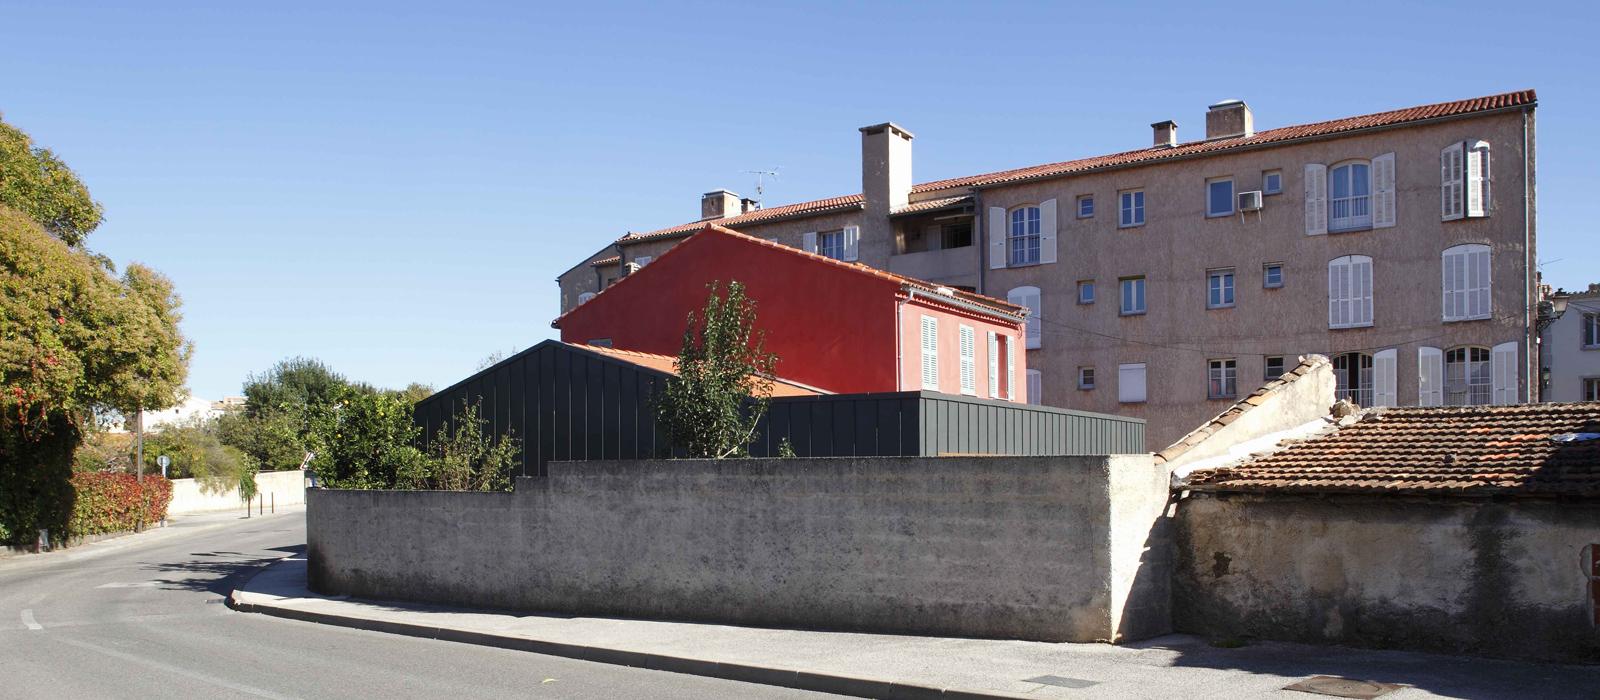 Extension salle communale moderne à Sollies-Pont